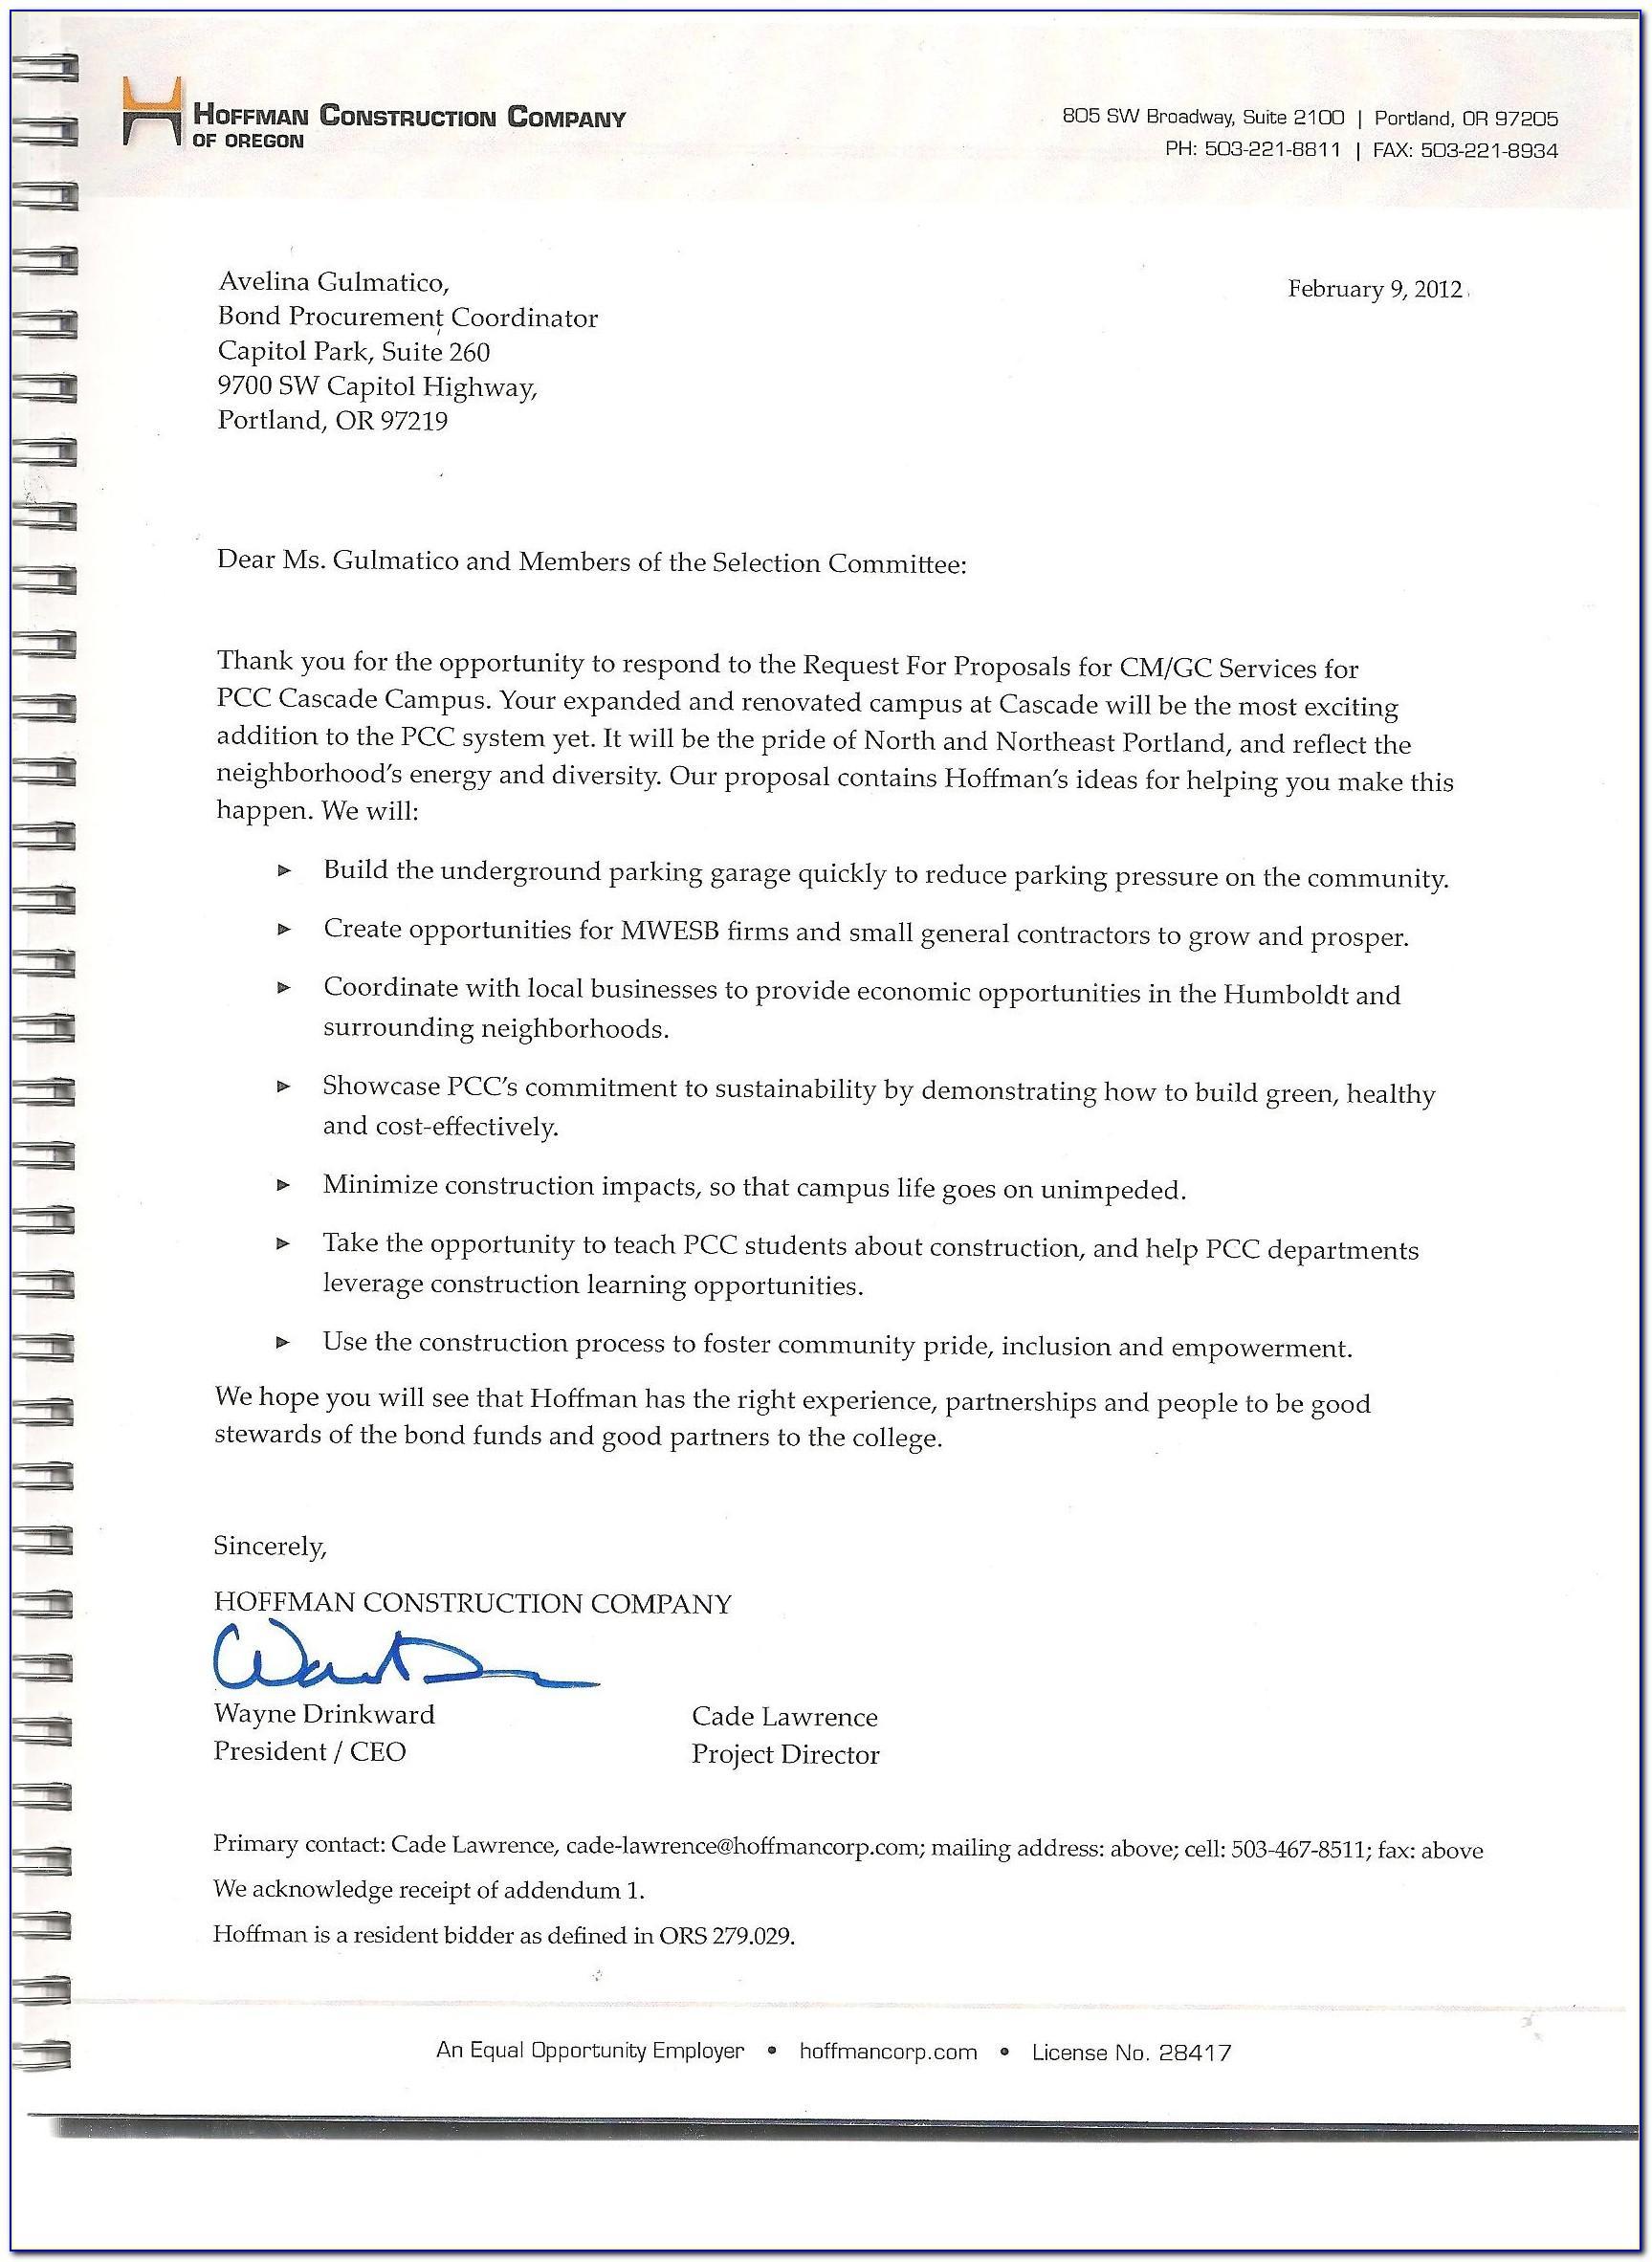 Sample Rfp Response Executive Summary